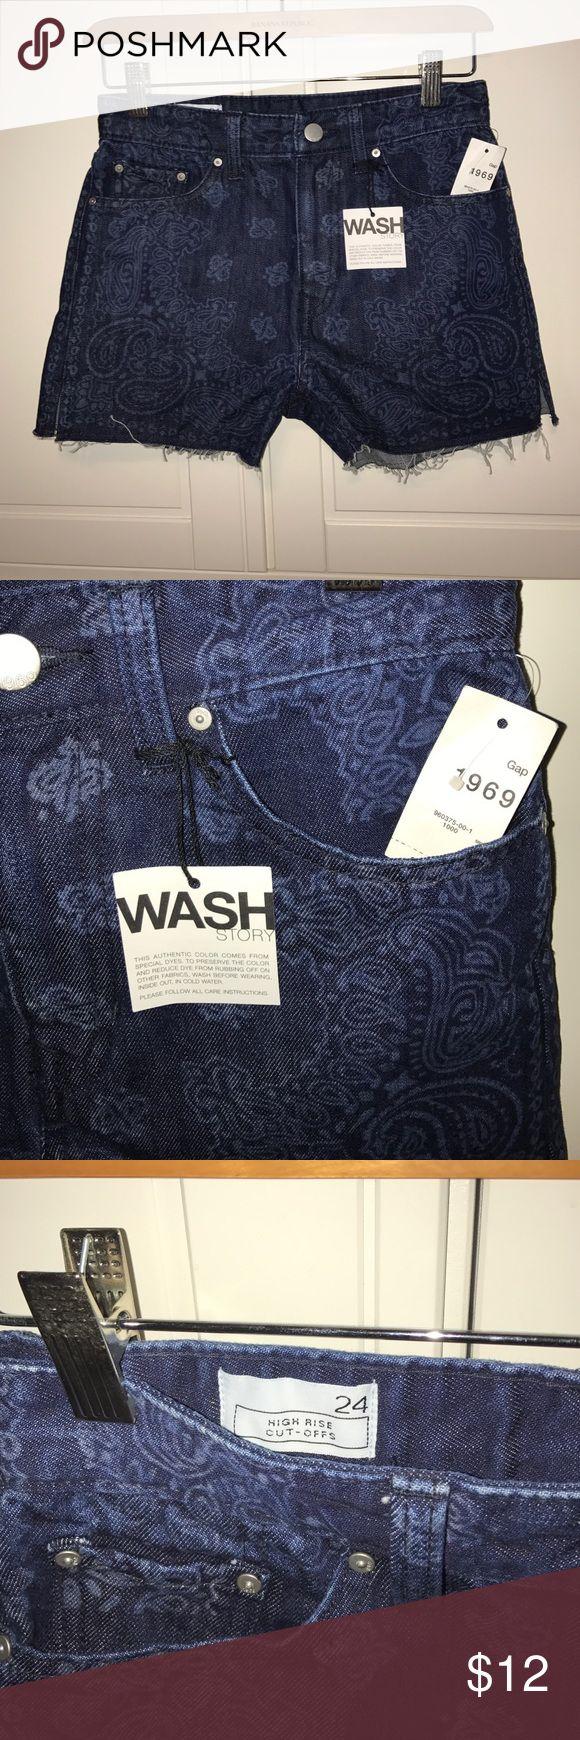 Girls Gap Jean Shorts HighRise CutOffs Size 24 Girls Gap Jean Shorts HighRise CutOffs Size 24 with tags GAP Shorts Jean Shorts